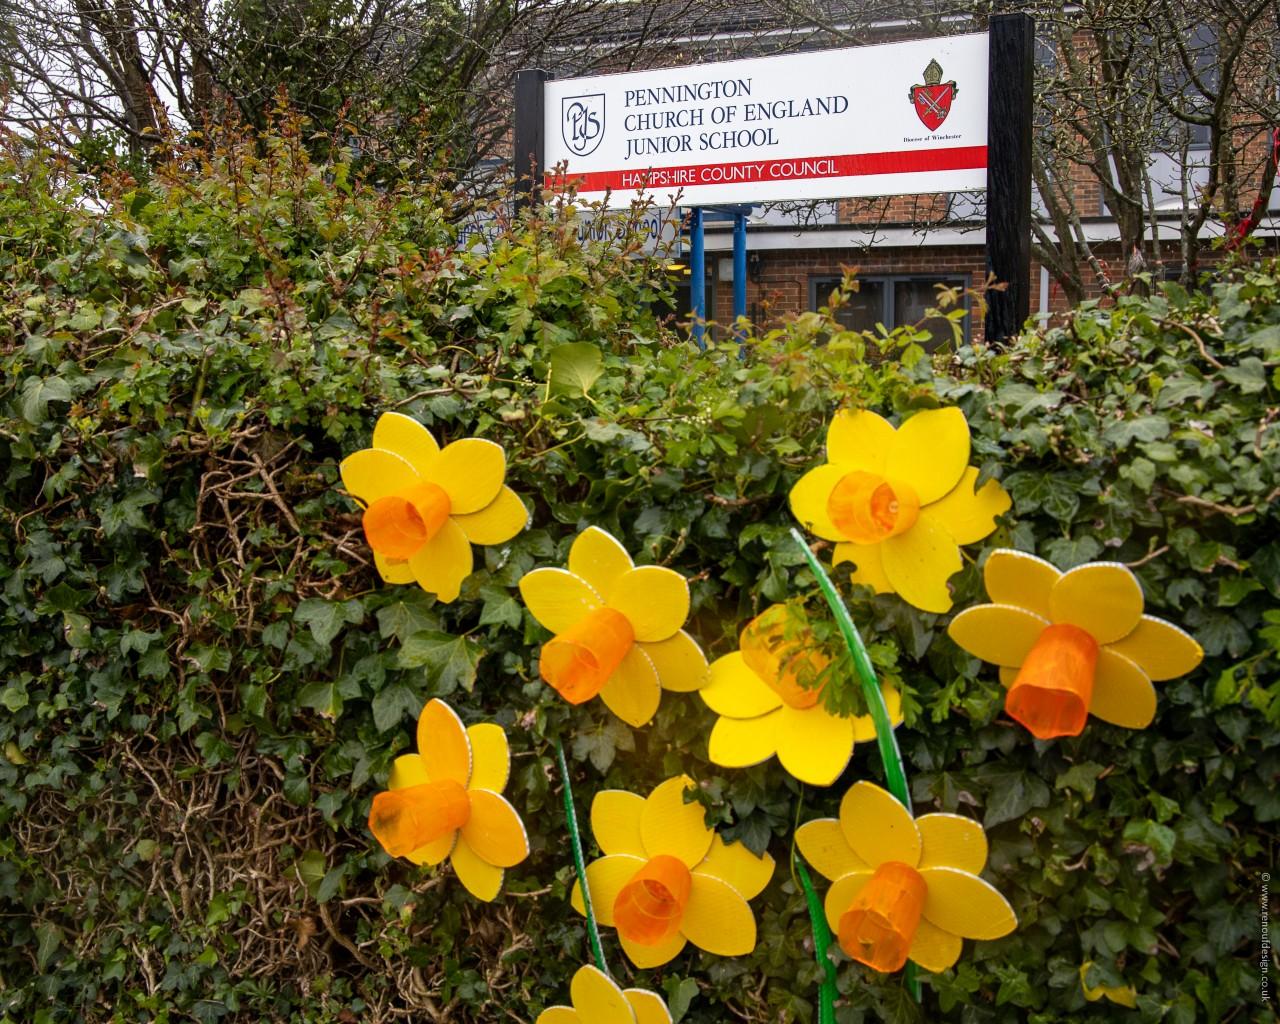 Pennington Daffodils outside Pennington Infant School